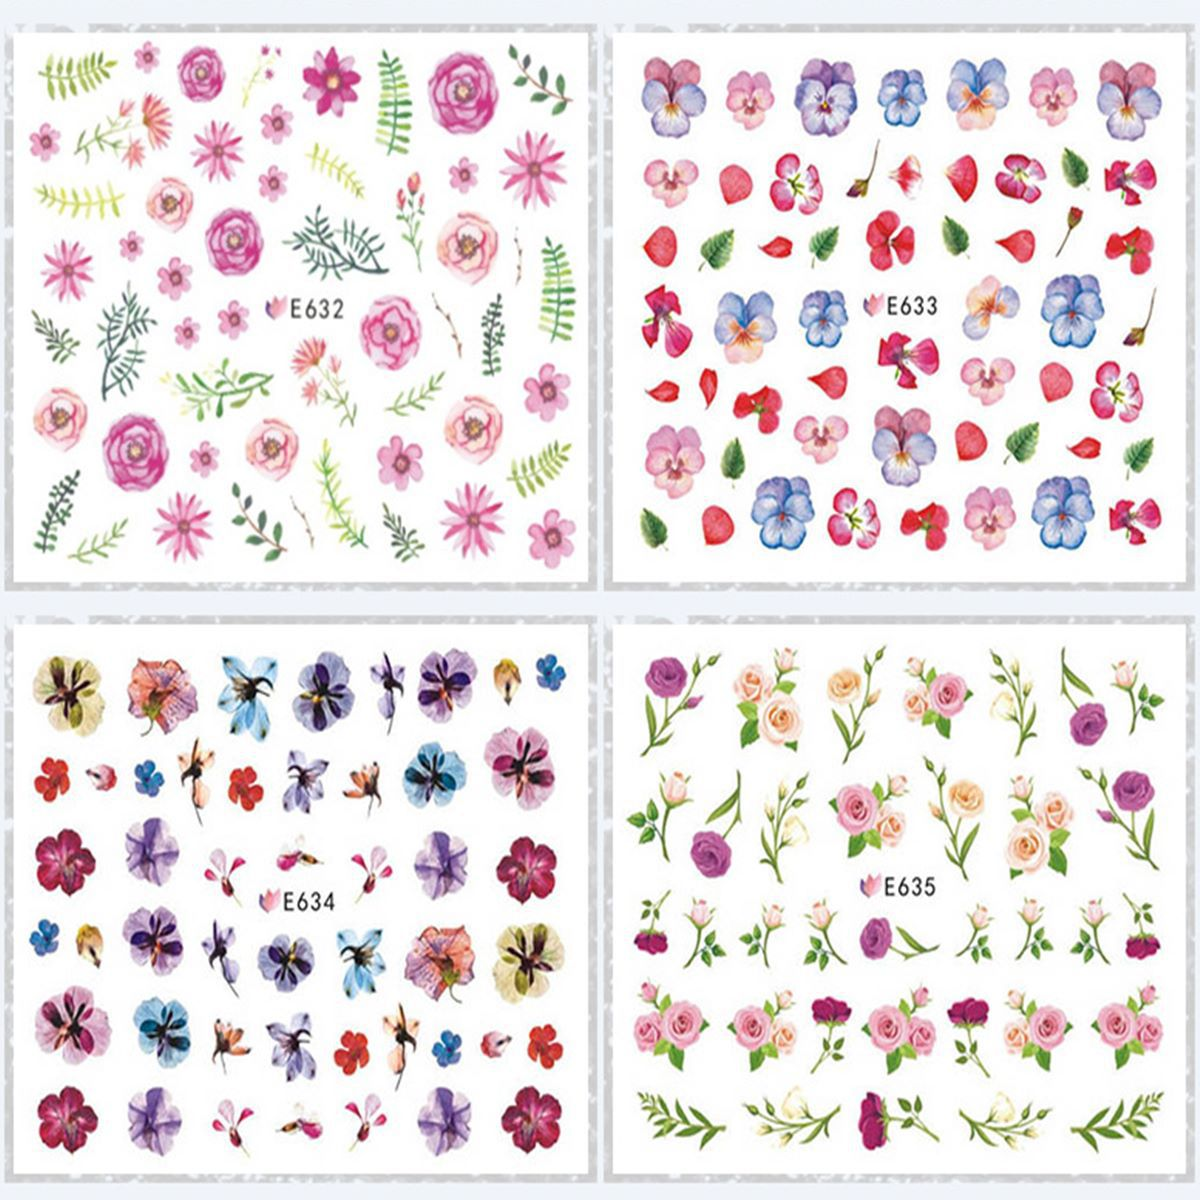 E622-643 Series 3D Suspender Strap Glue Nail Sticker 3D Nail Sticker Manicure Spring Flower Nail Decals